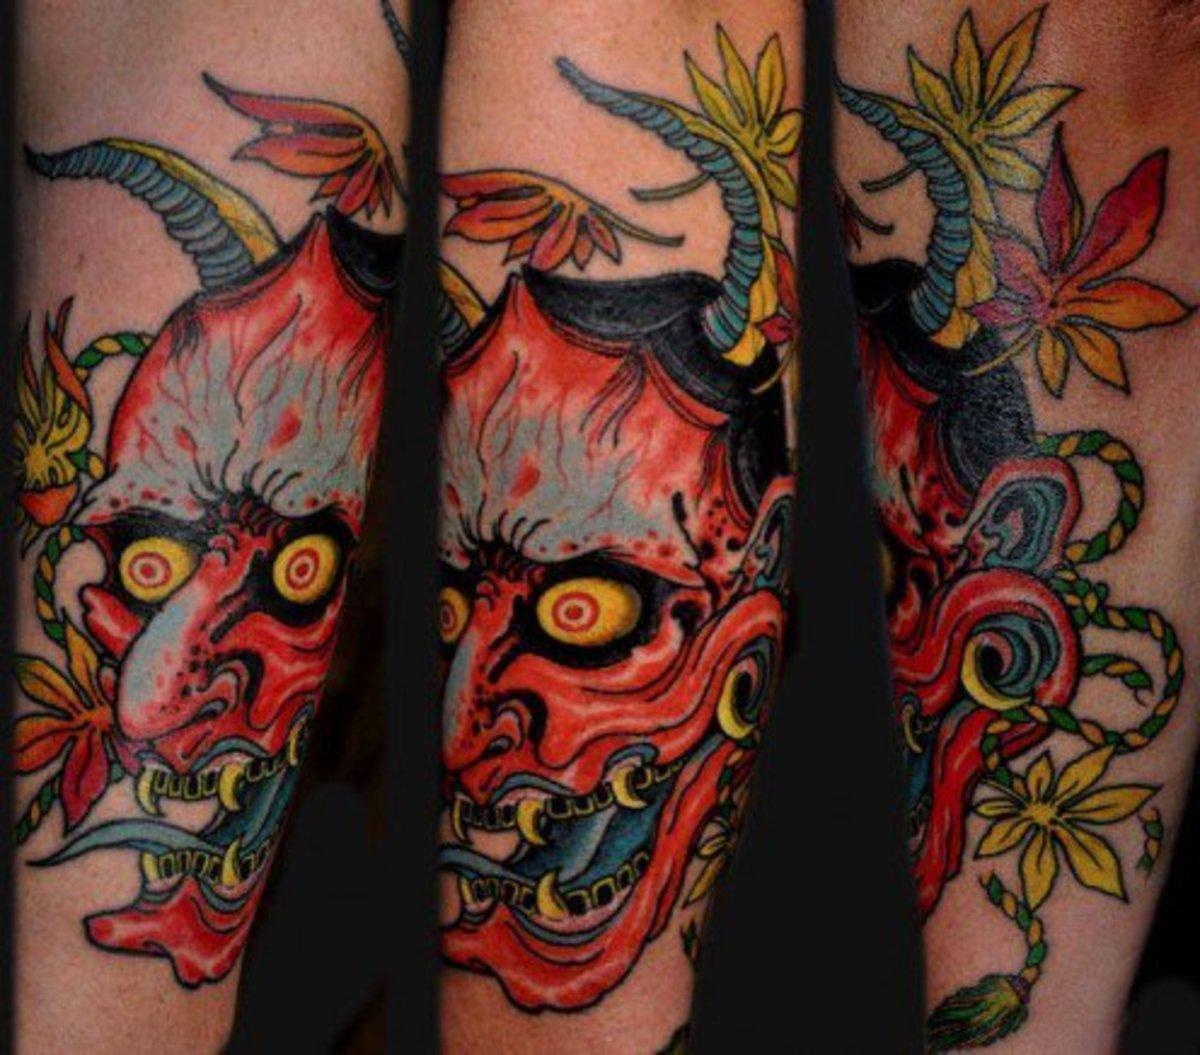 931fb21e6 Japanese Hannya Tattoos: Origins, Meanings & Ideas | TatRing